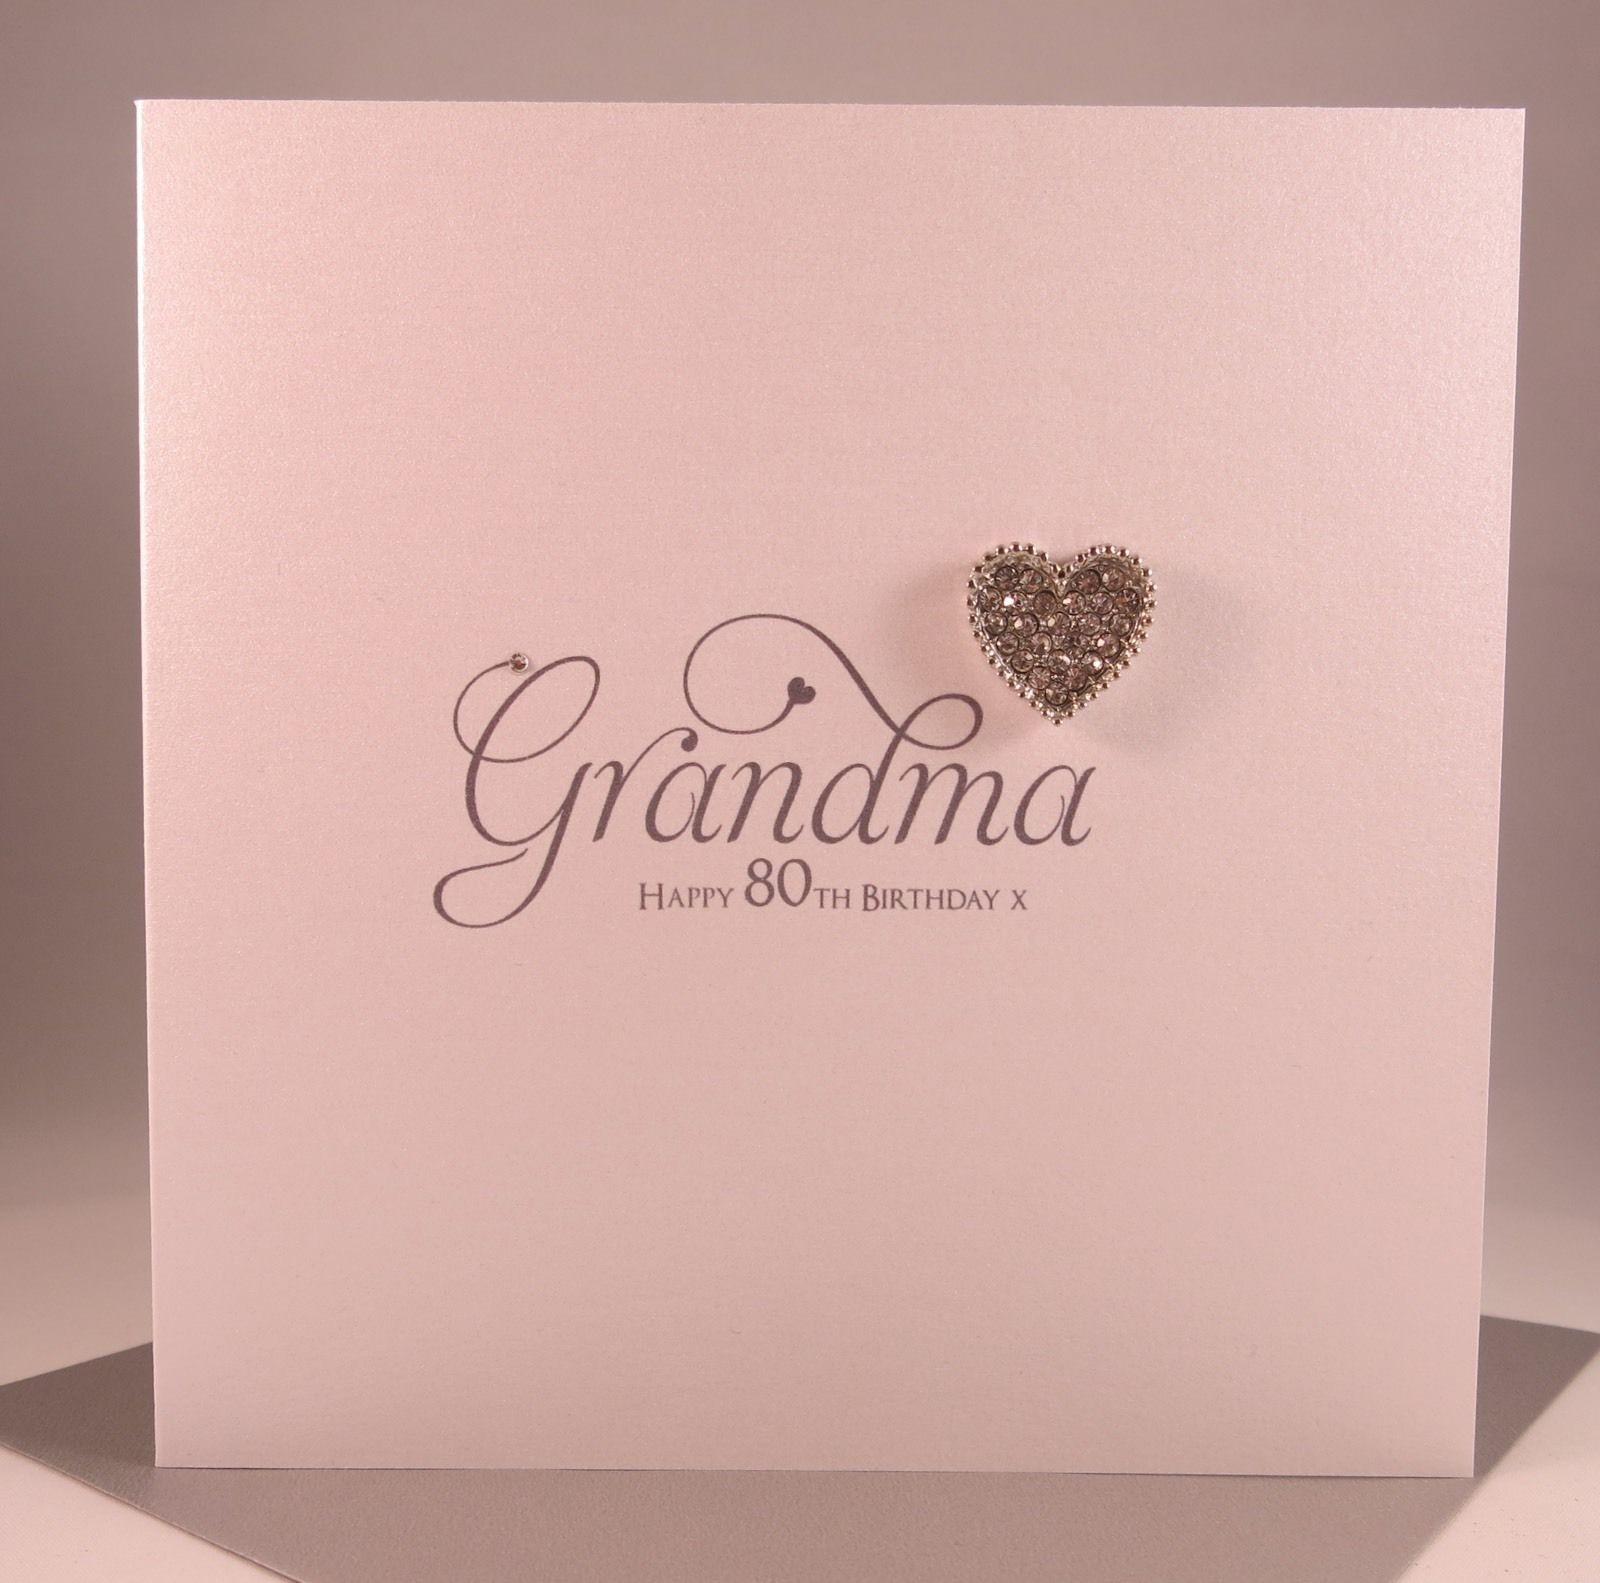 gbp luxury diamanté heart grandma birthday card grandmother